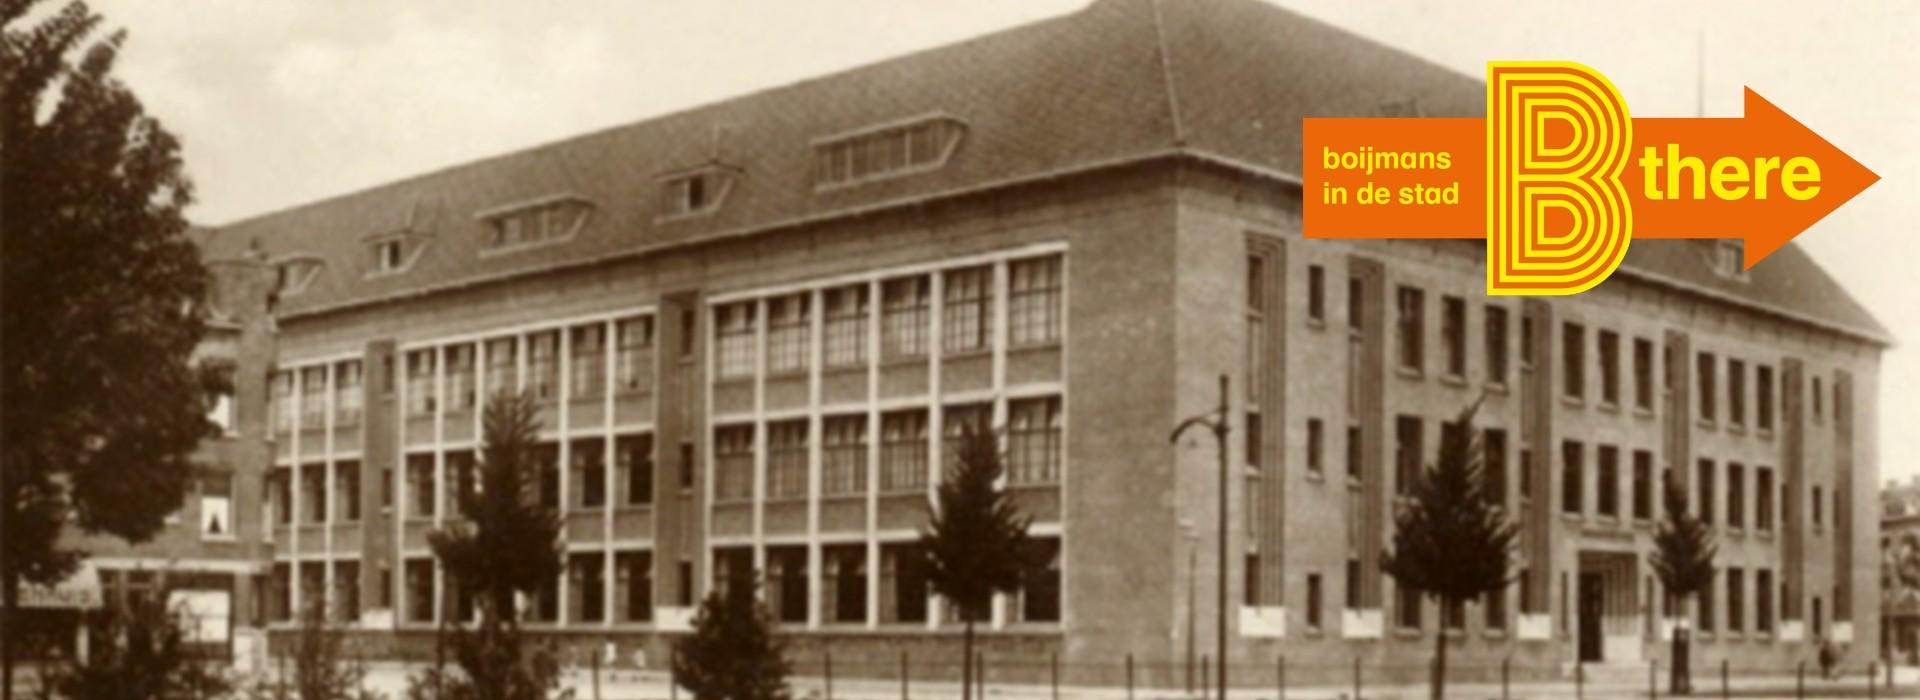 The Depot explained - Museum Boijmans Van Beuningen